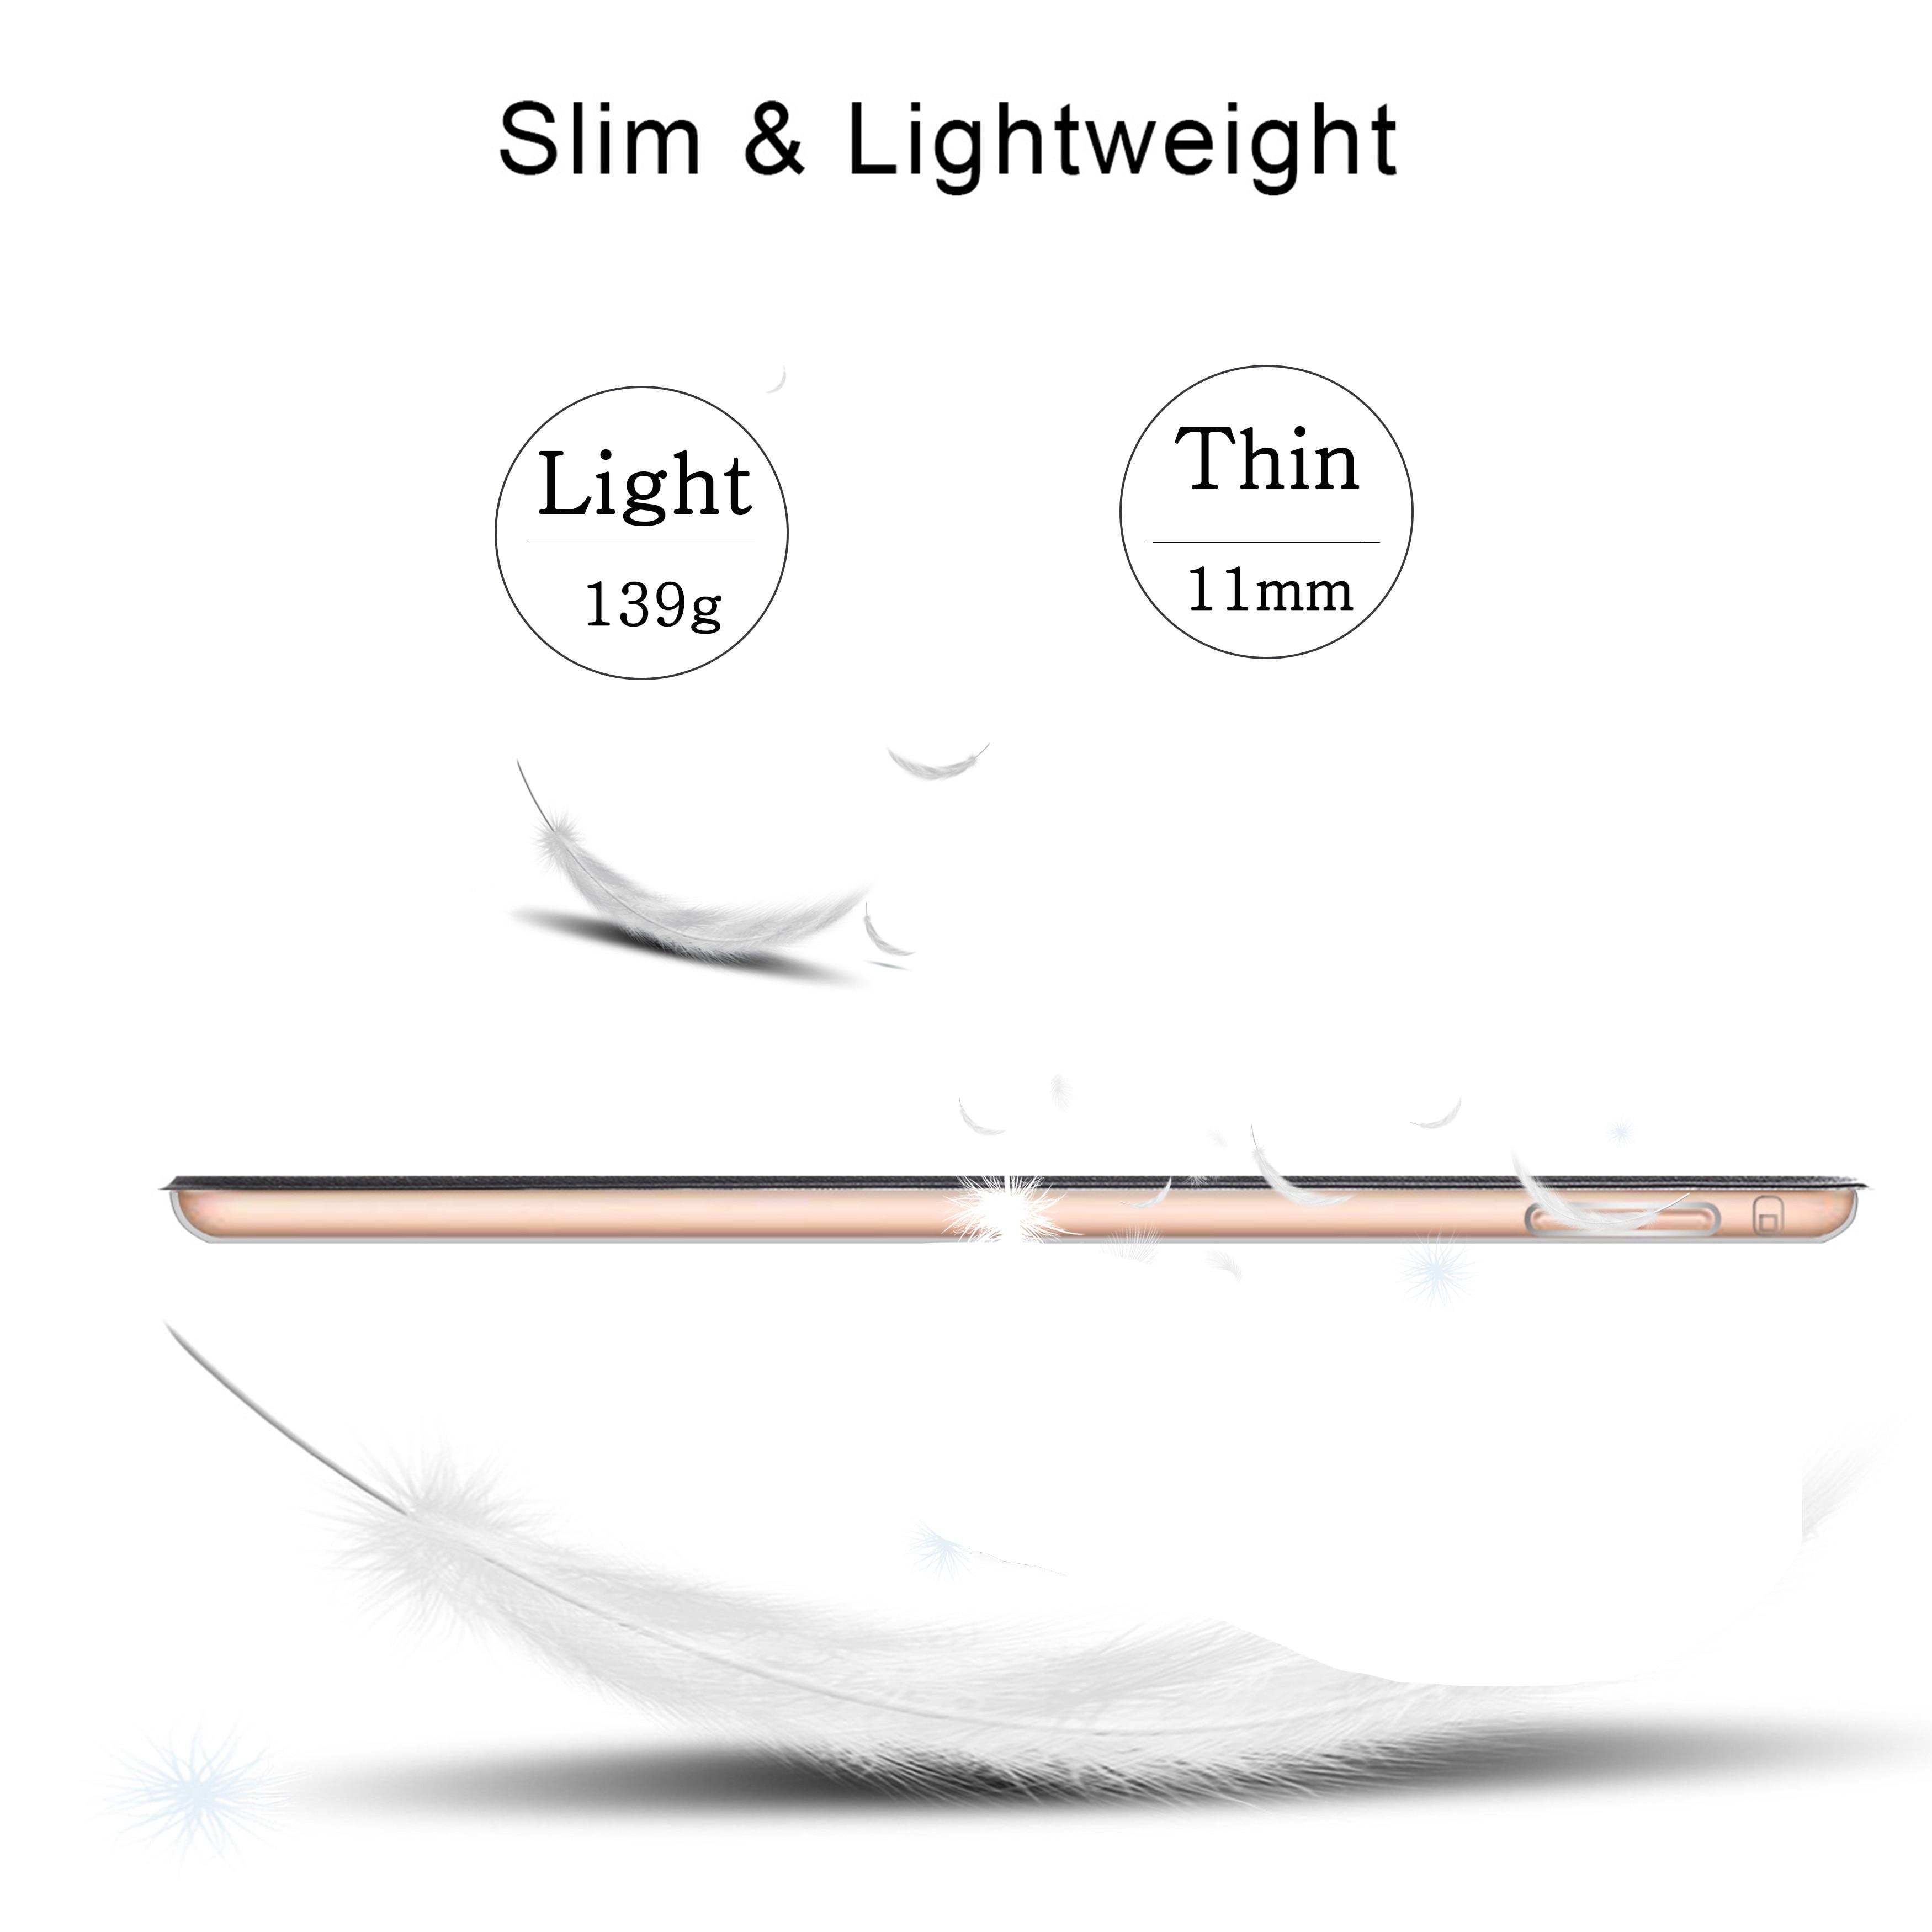 Чехол для планшета Samsung Galaxy Tab A a6 7,0 дюйма T280 T285 SM-T280 Funda Smart Auto wake up, защитный чехол-подставка-4